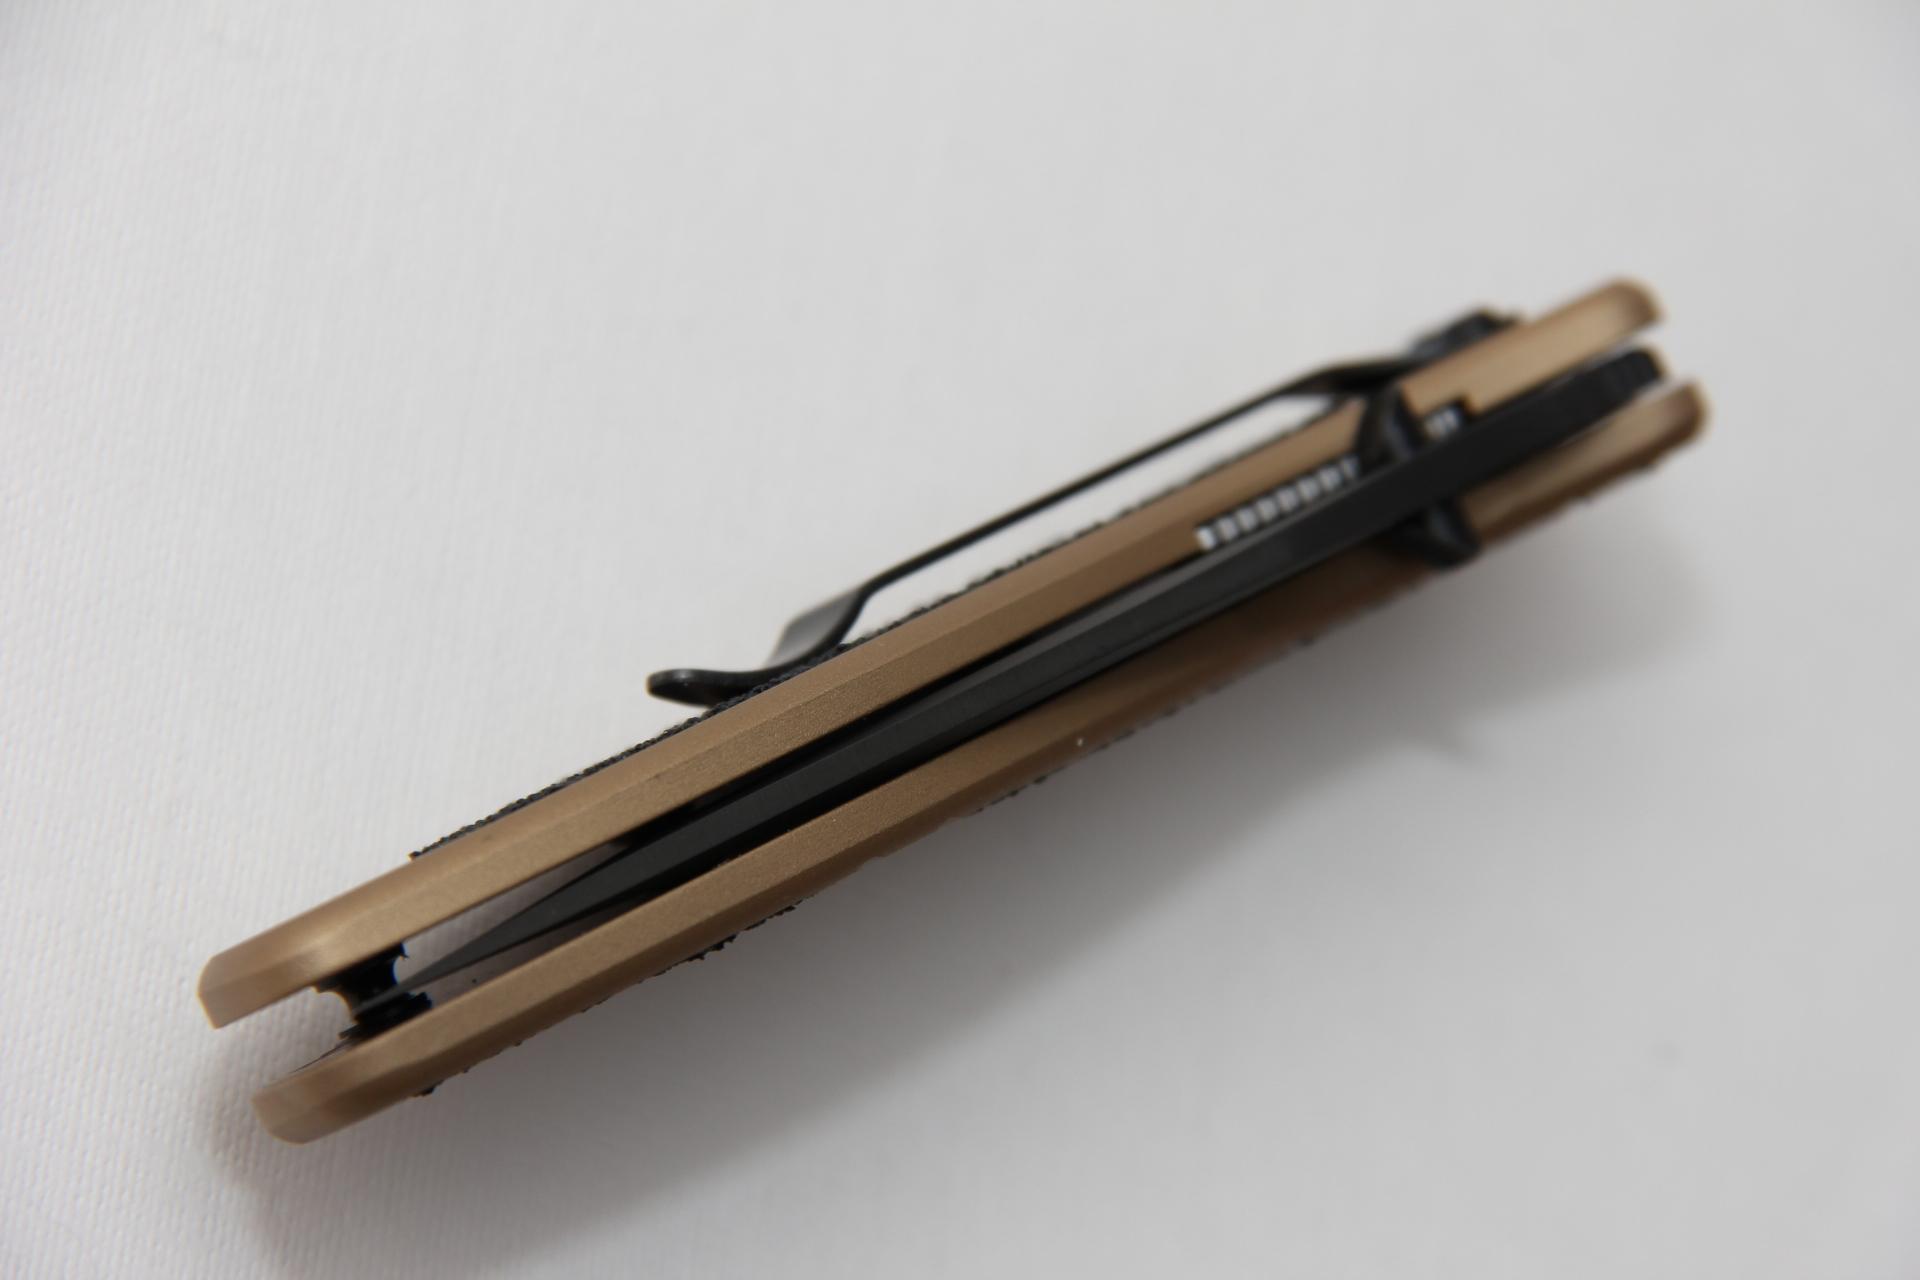 Нож Kershaw 1670DSBLK Blur Desert Sand - фотография